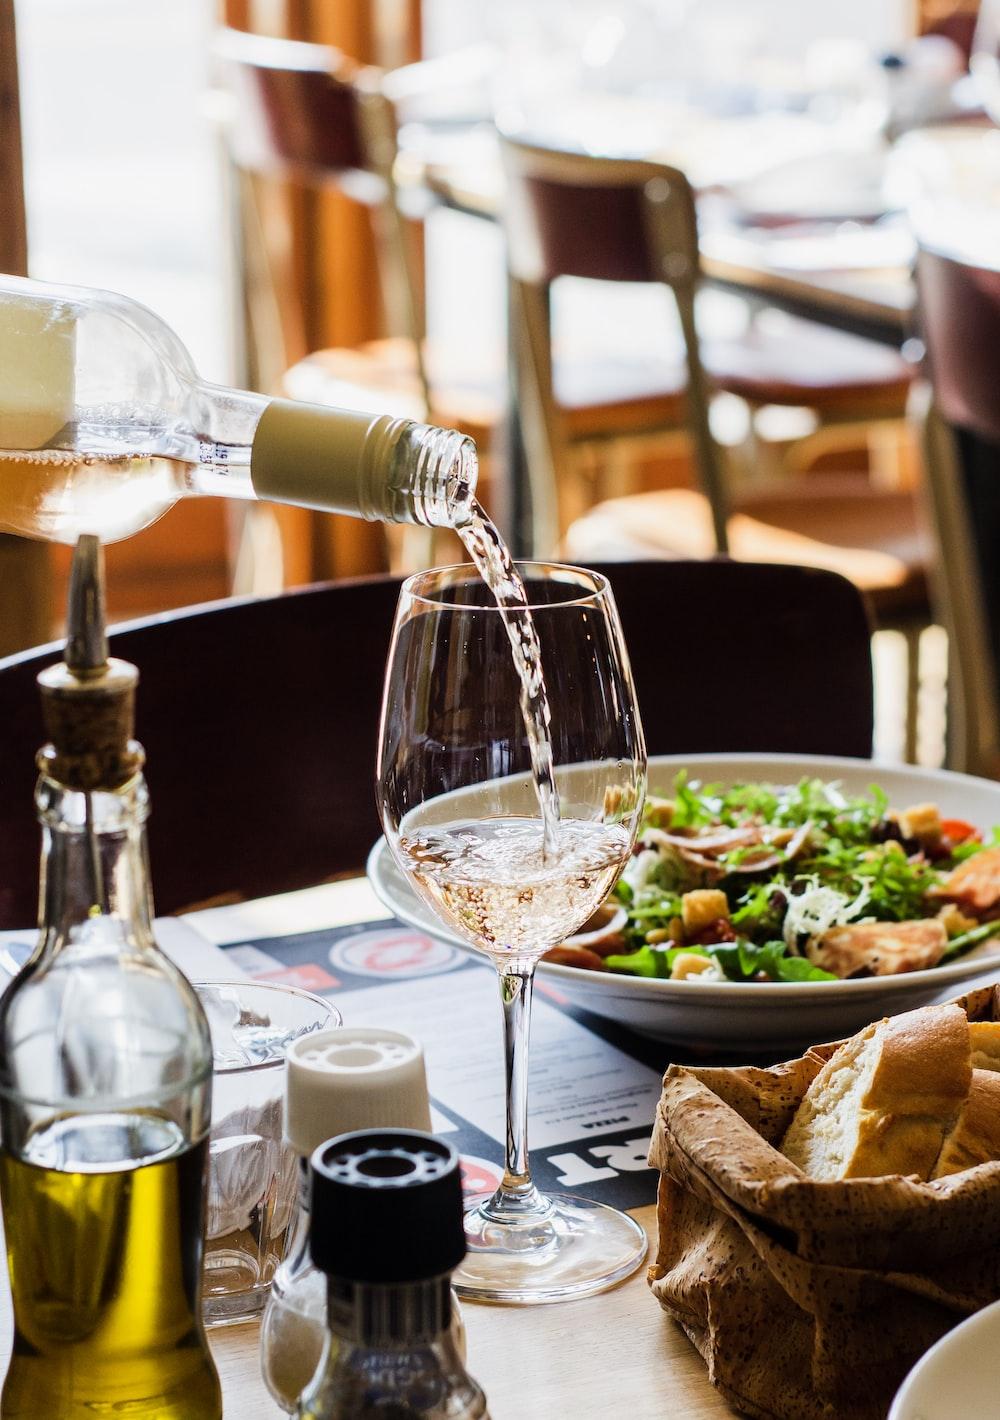 person pouring wine in wine glass